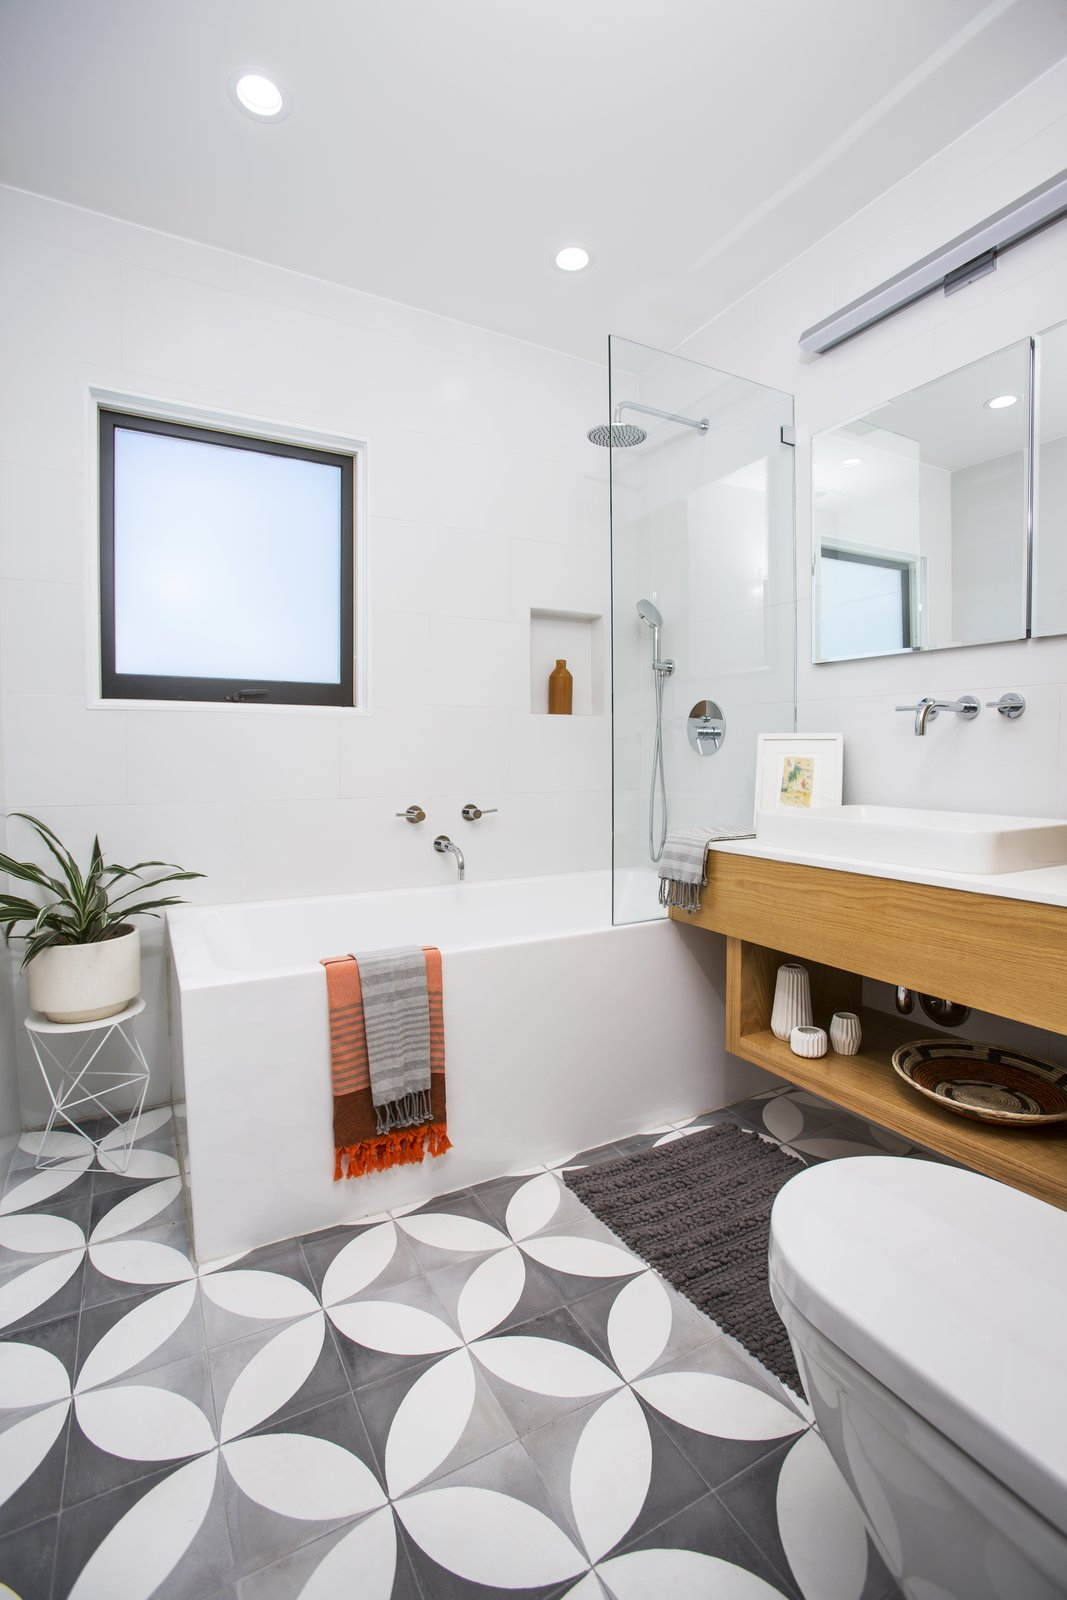 Bath Room, Concrete Floor, Engineered Quartz Counter, Corner Shower, Vessel Sink, Wall Lighting, Recessed Lighting, Ceramic Tile Wall, Ceiling Lighting, Soaking Tub, and One Piece Toilet  Silverlake on Riverside Terrace